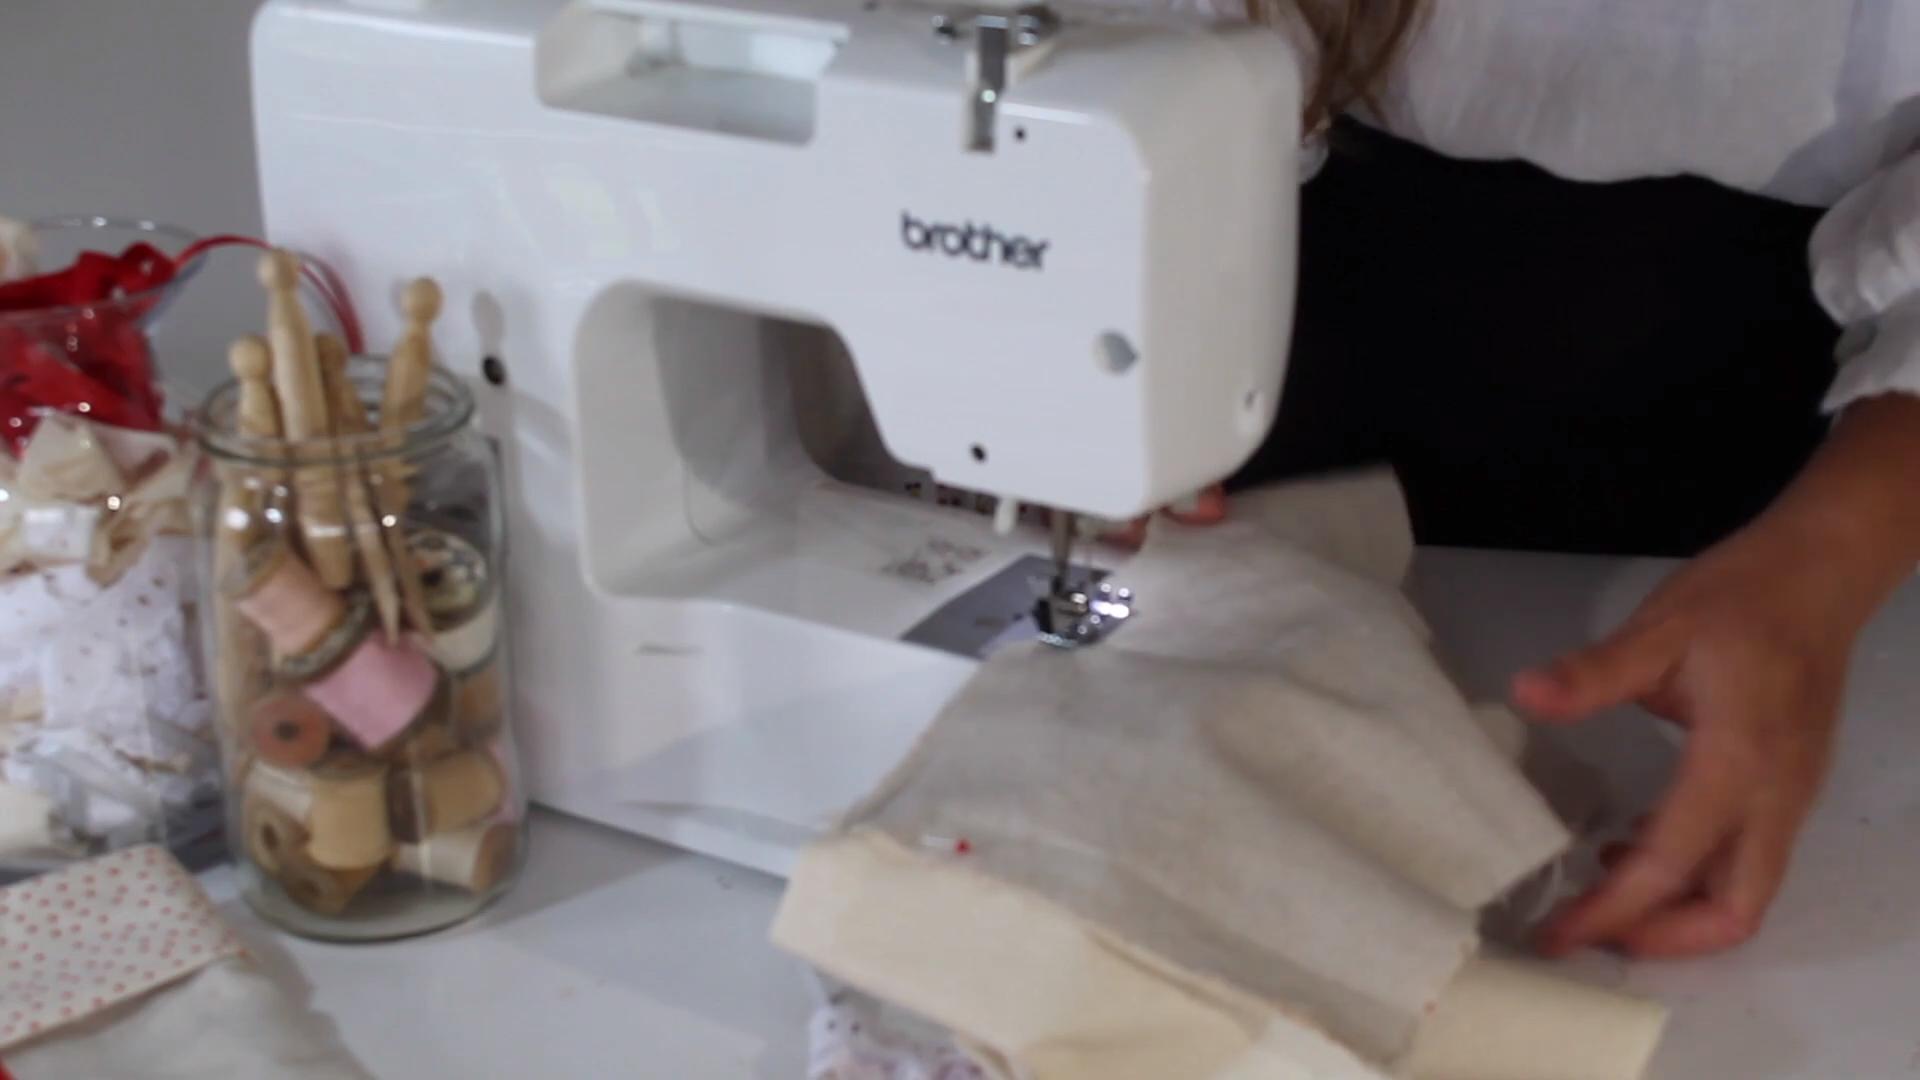 sewing around the stocking